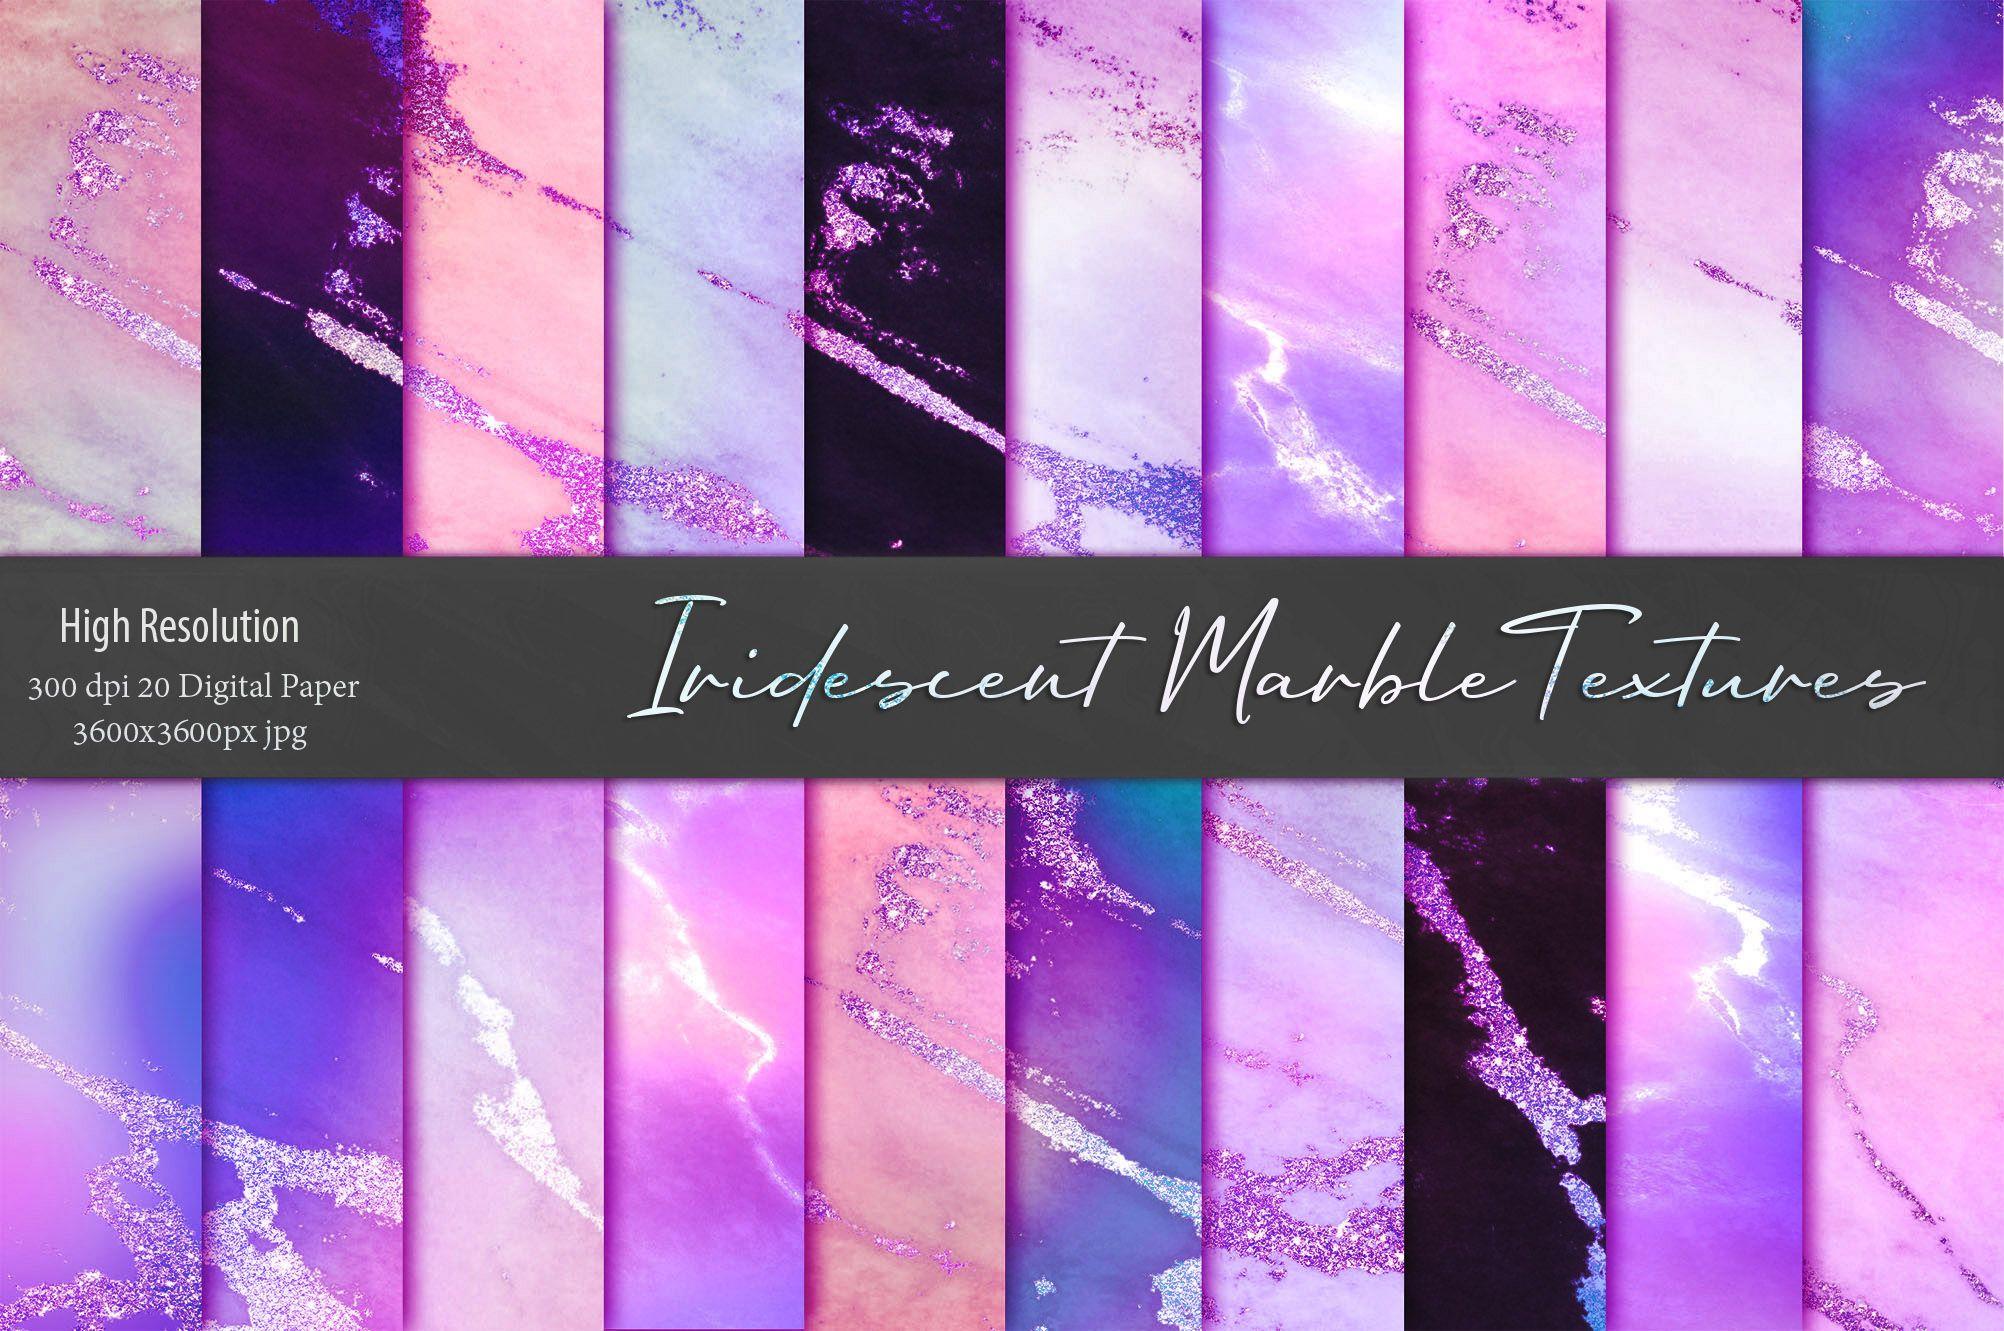 Iridescent Marble Textures #marbletexture